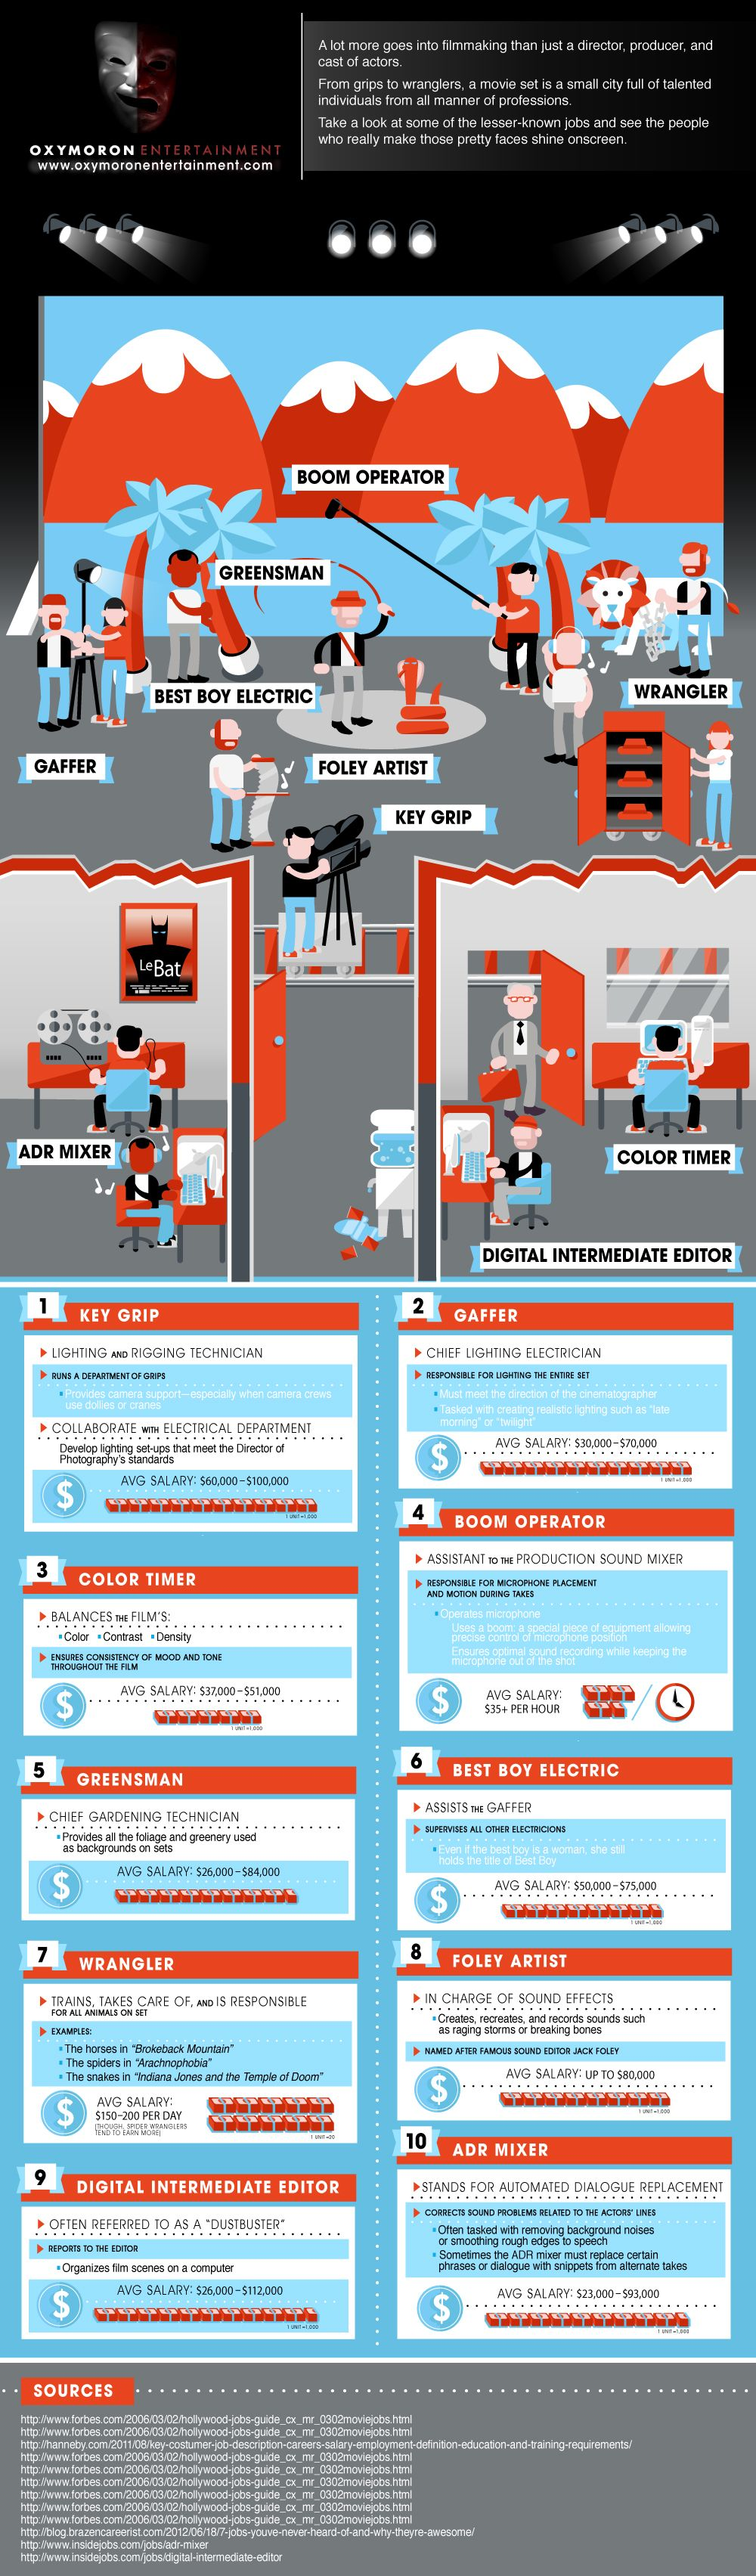 Oxymoron Entertainment Infographic  Odd Jobs On Movie Set A Lot